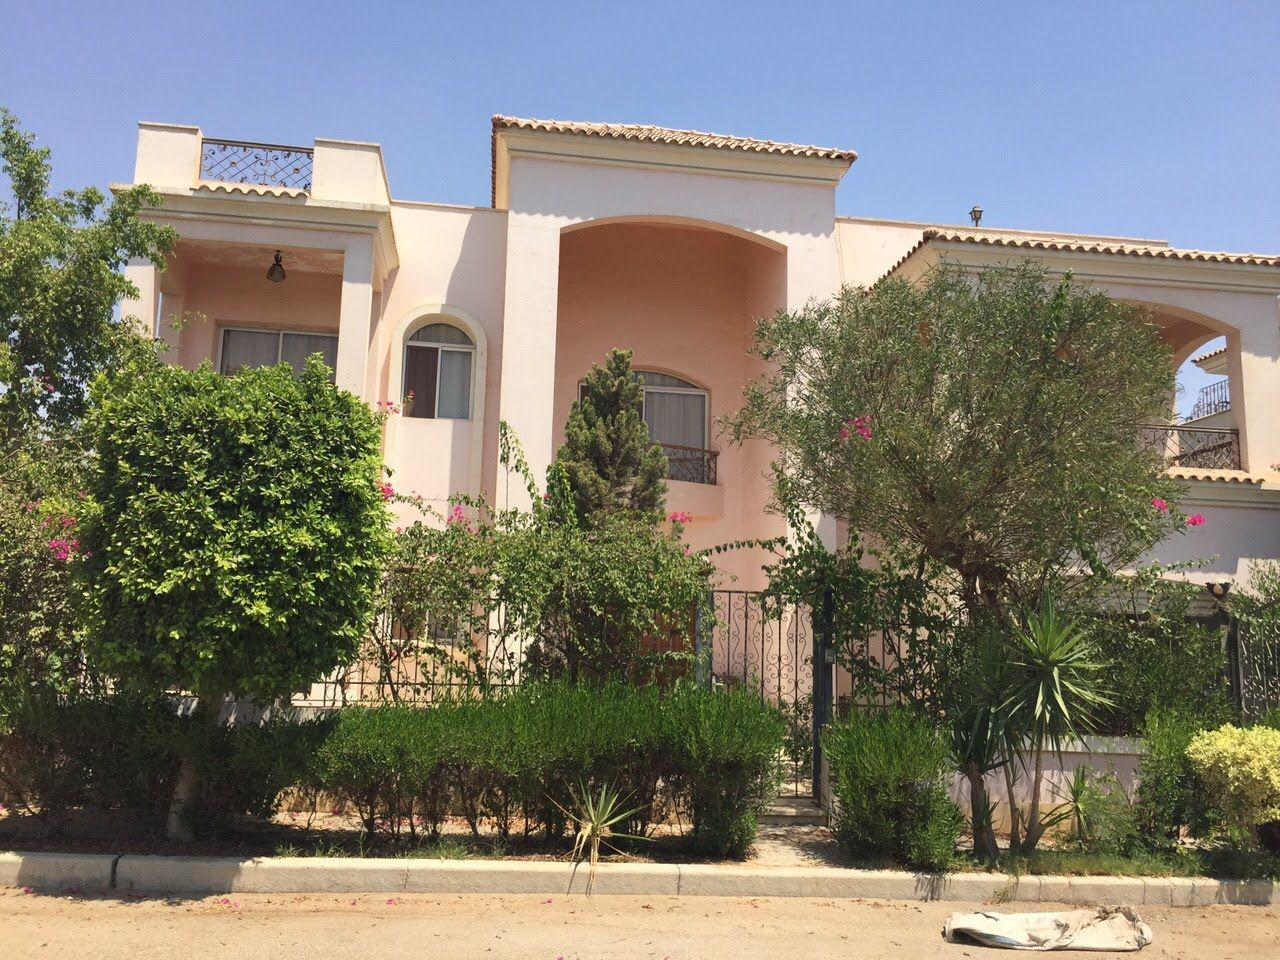 Pin On Sheikh Zayed Real Estate عقارات الشيخ زايد